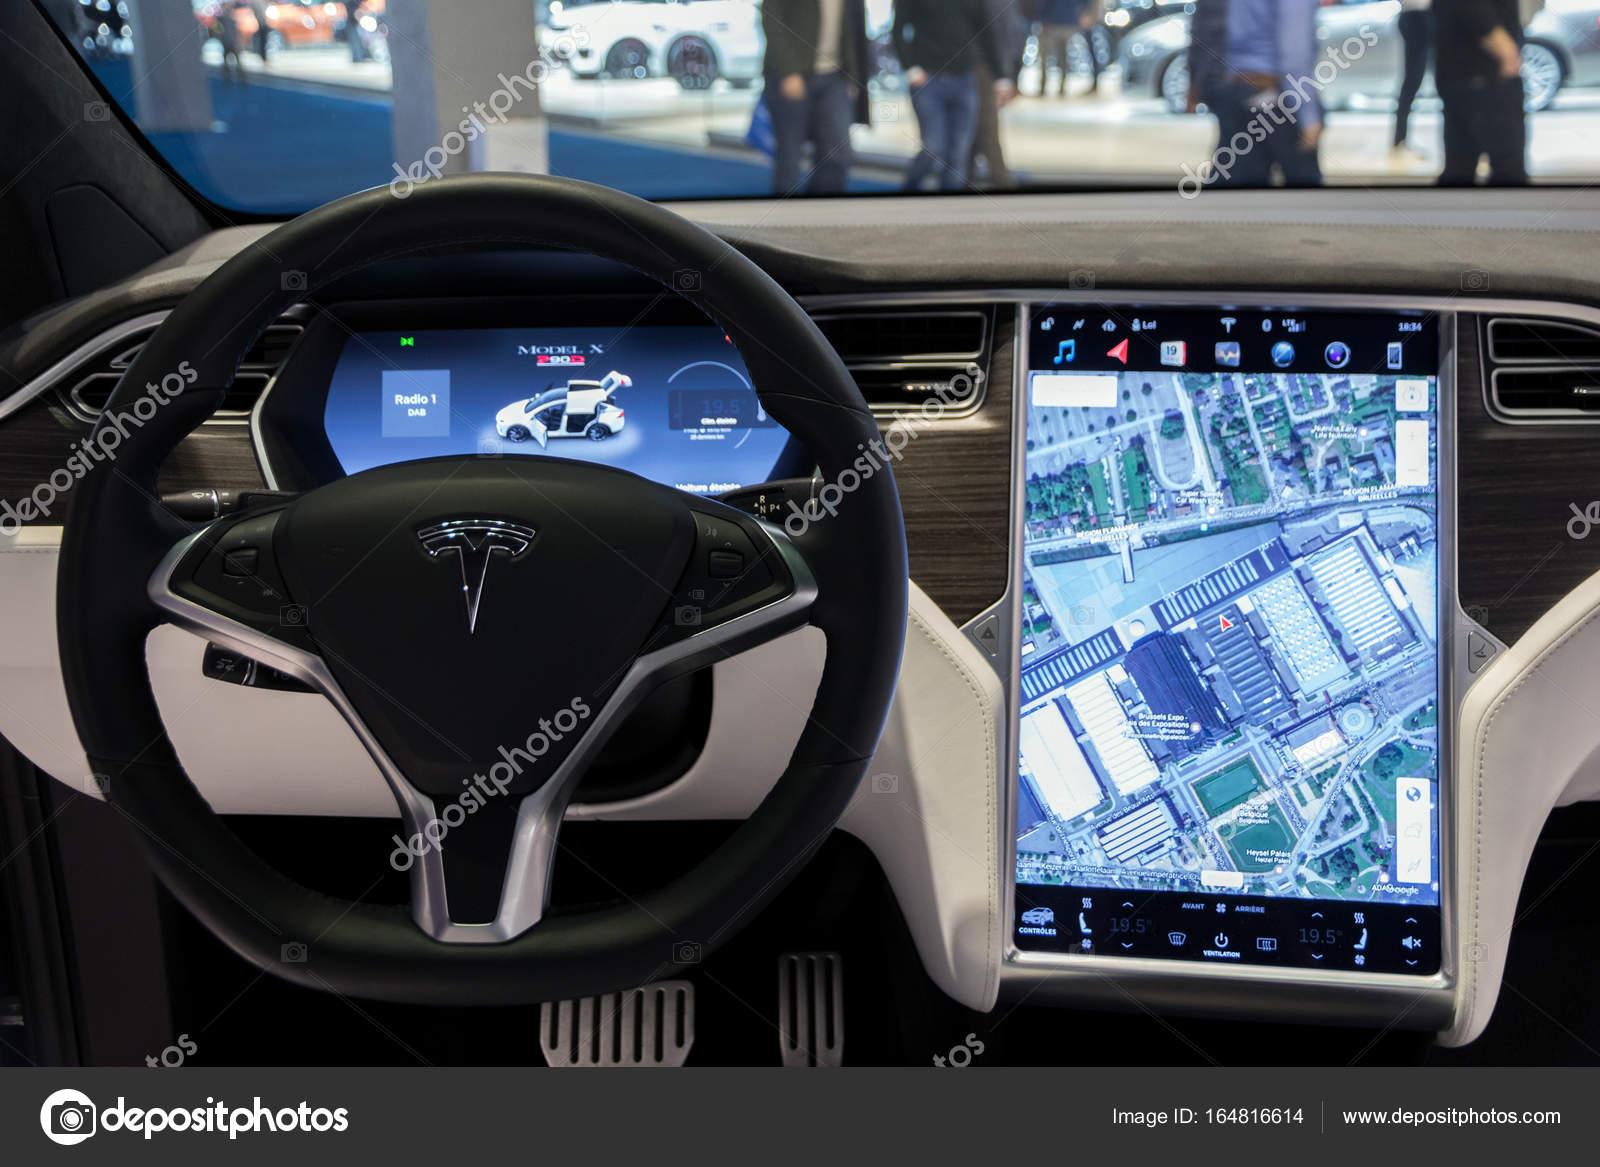 Tesla model x interieur autonavigatie u2013 redactionele stockfoto